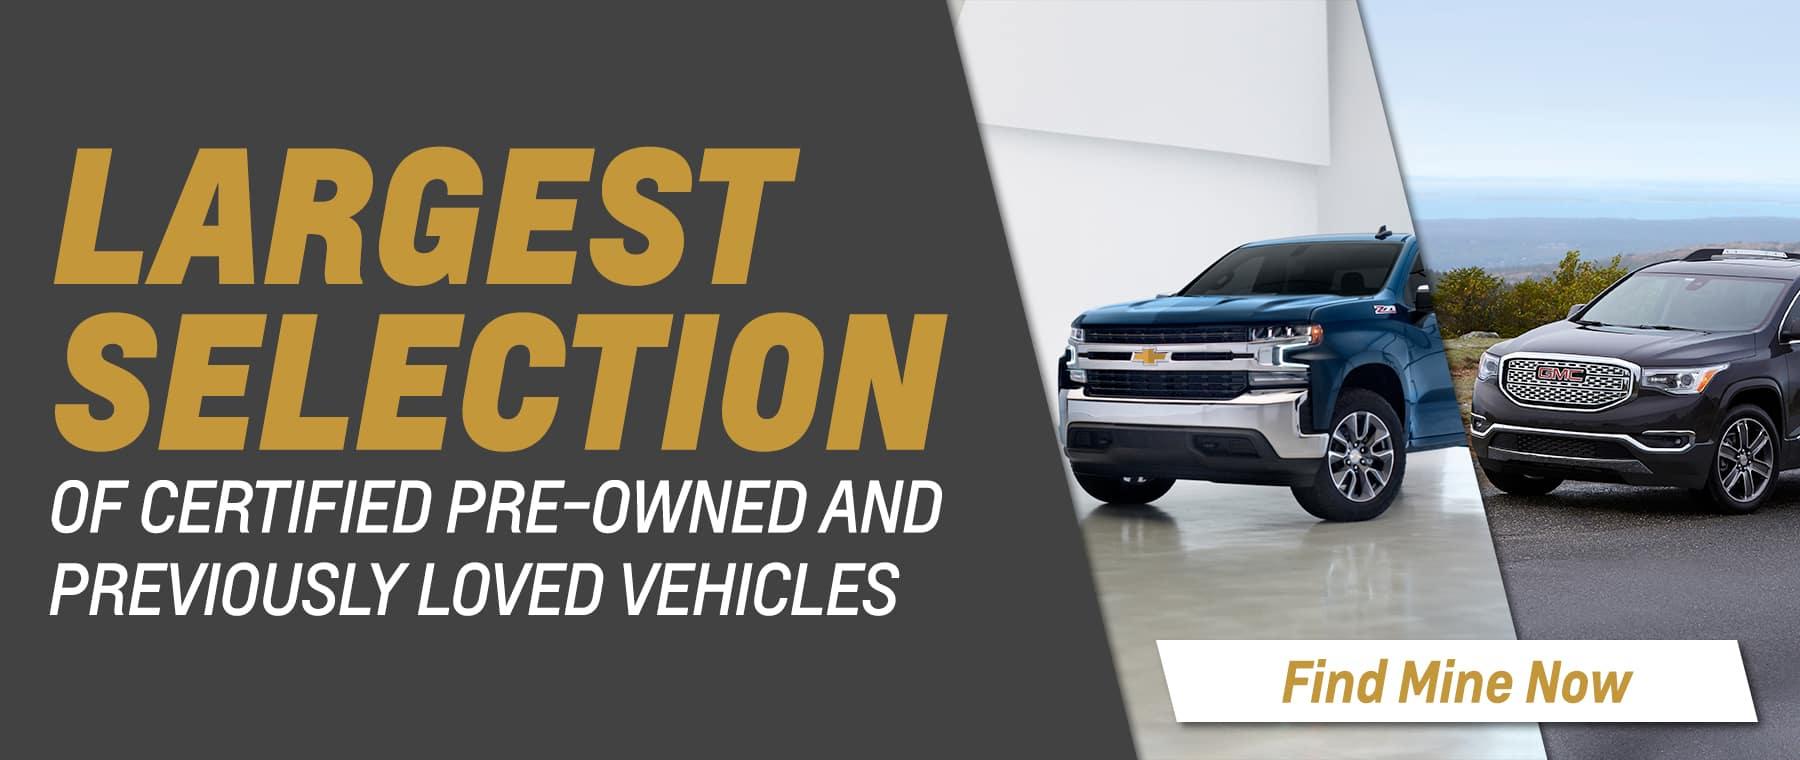 Chevy Dealers In Va >> Rick Hendrick Chevrolet Buick Gmc Richmond Gm Dealer Near